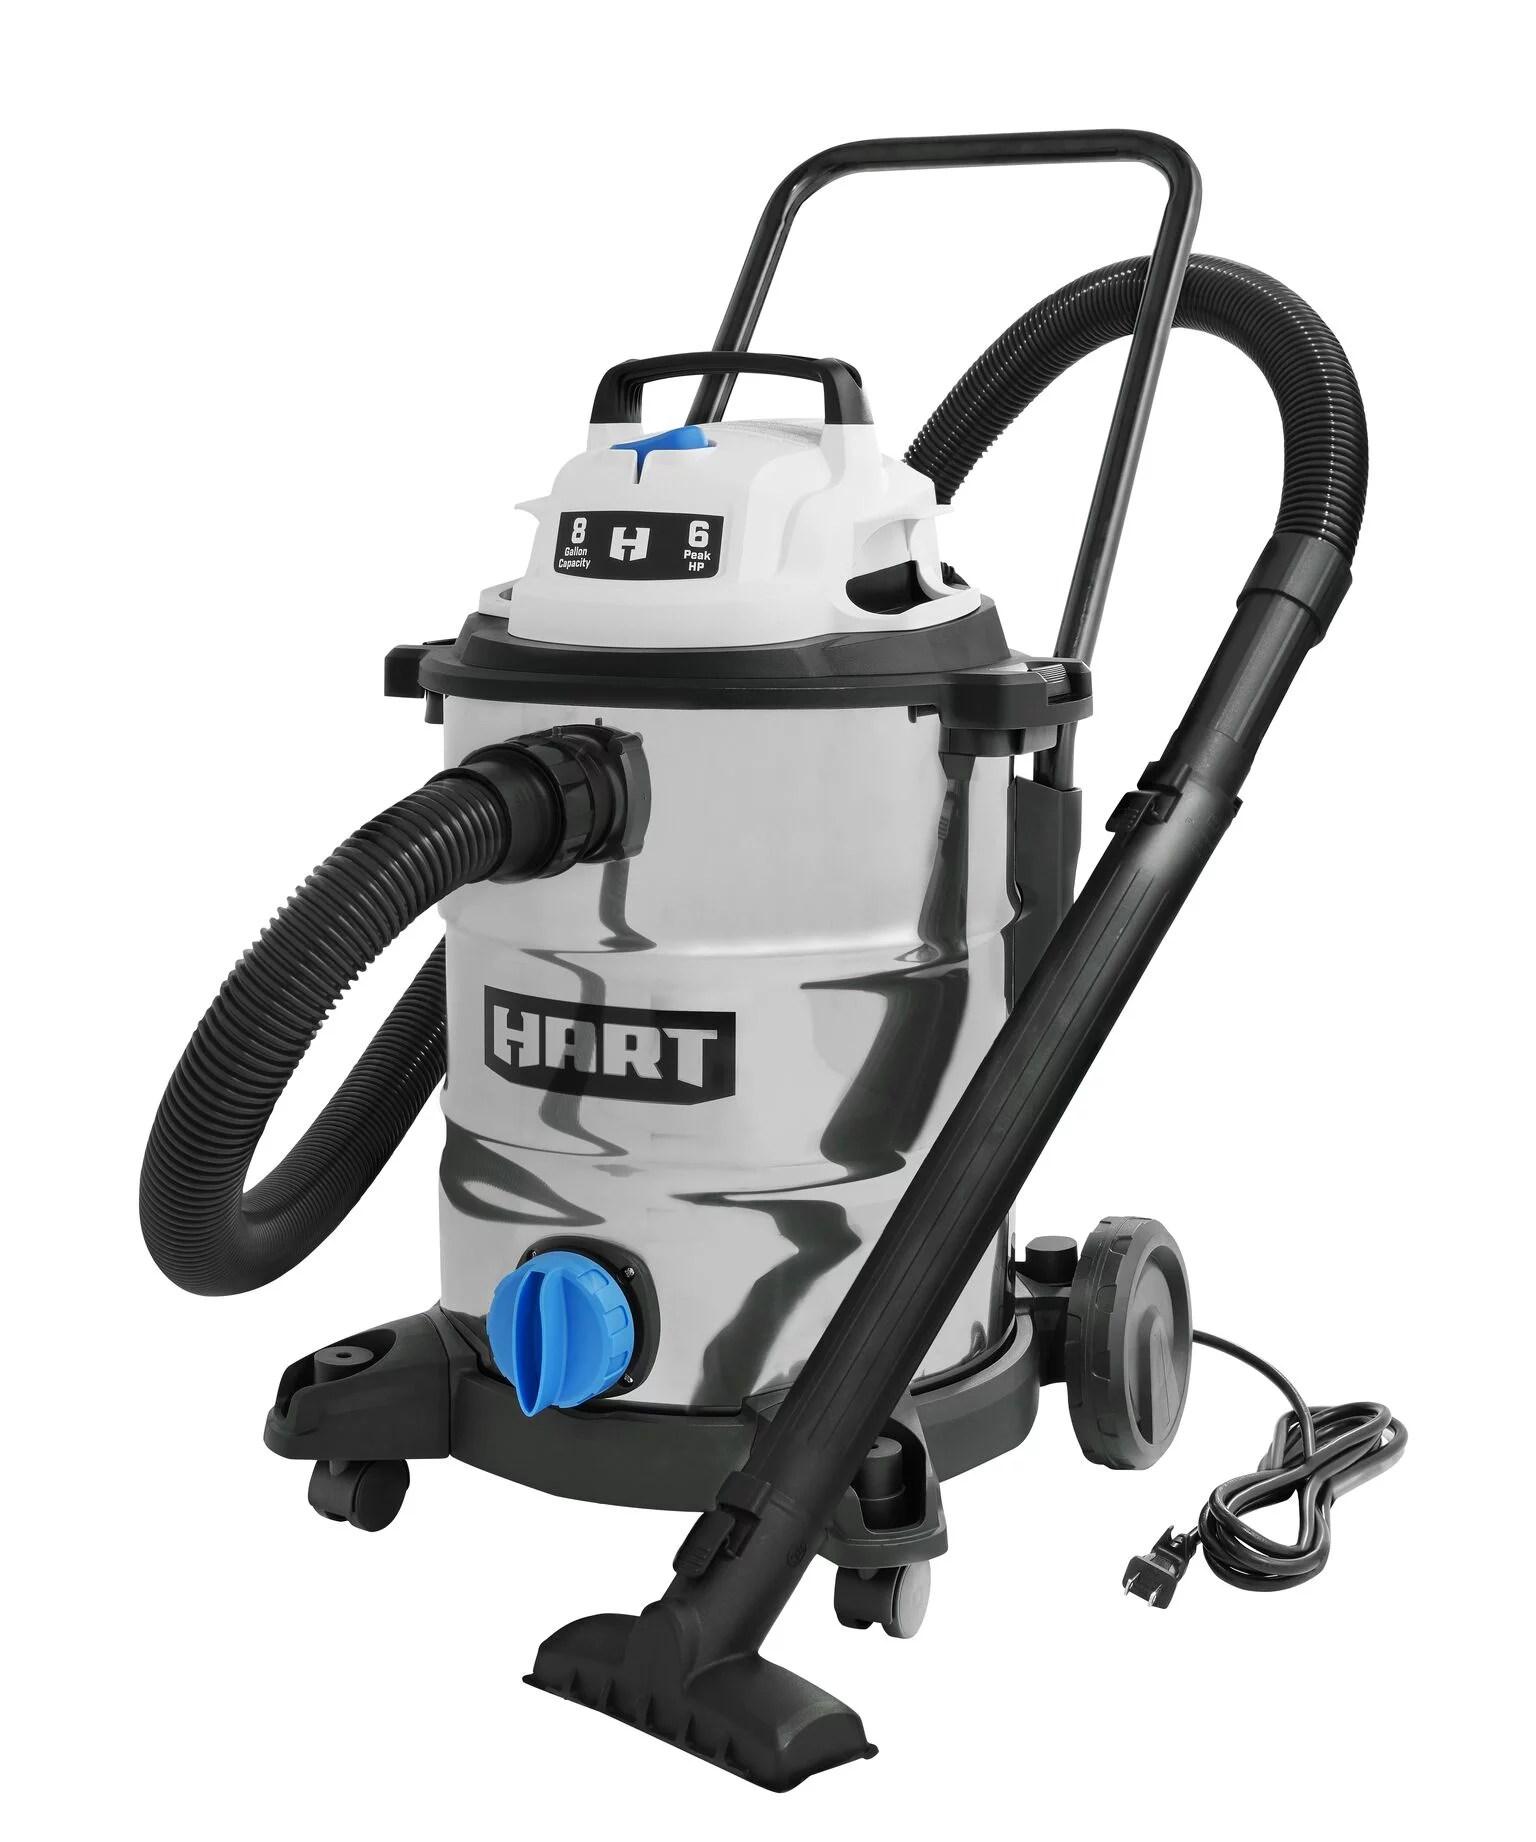 hart 8 gallon 6 0 peak hp stainless steel wet dry vacuum